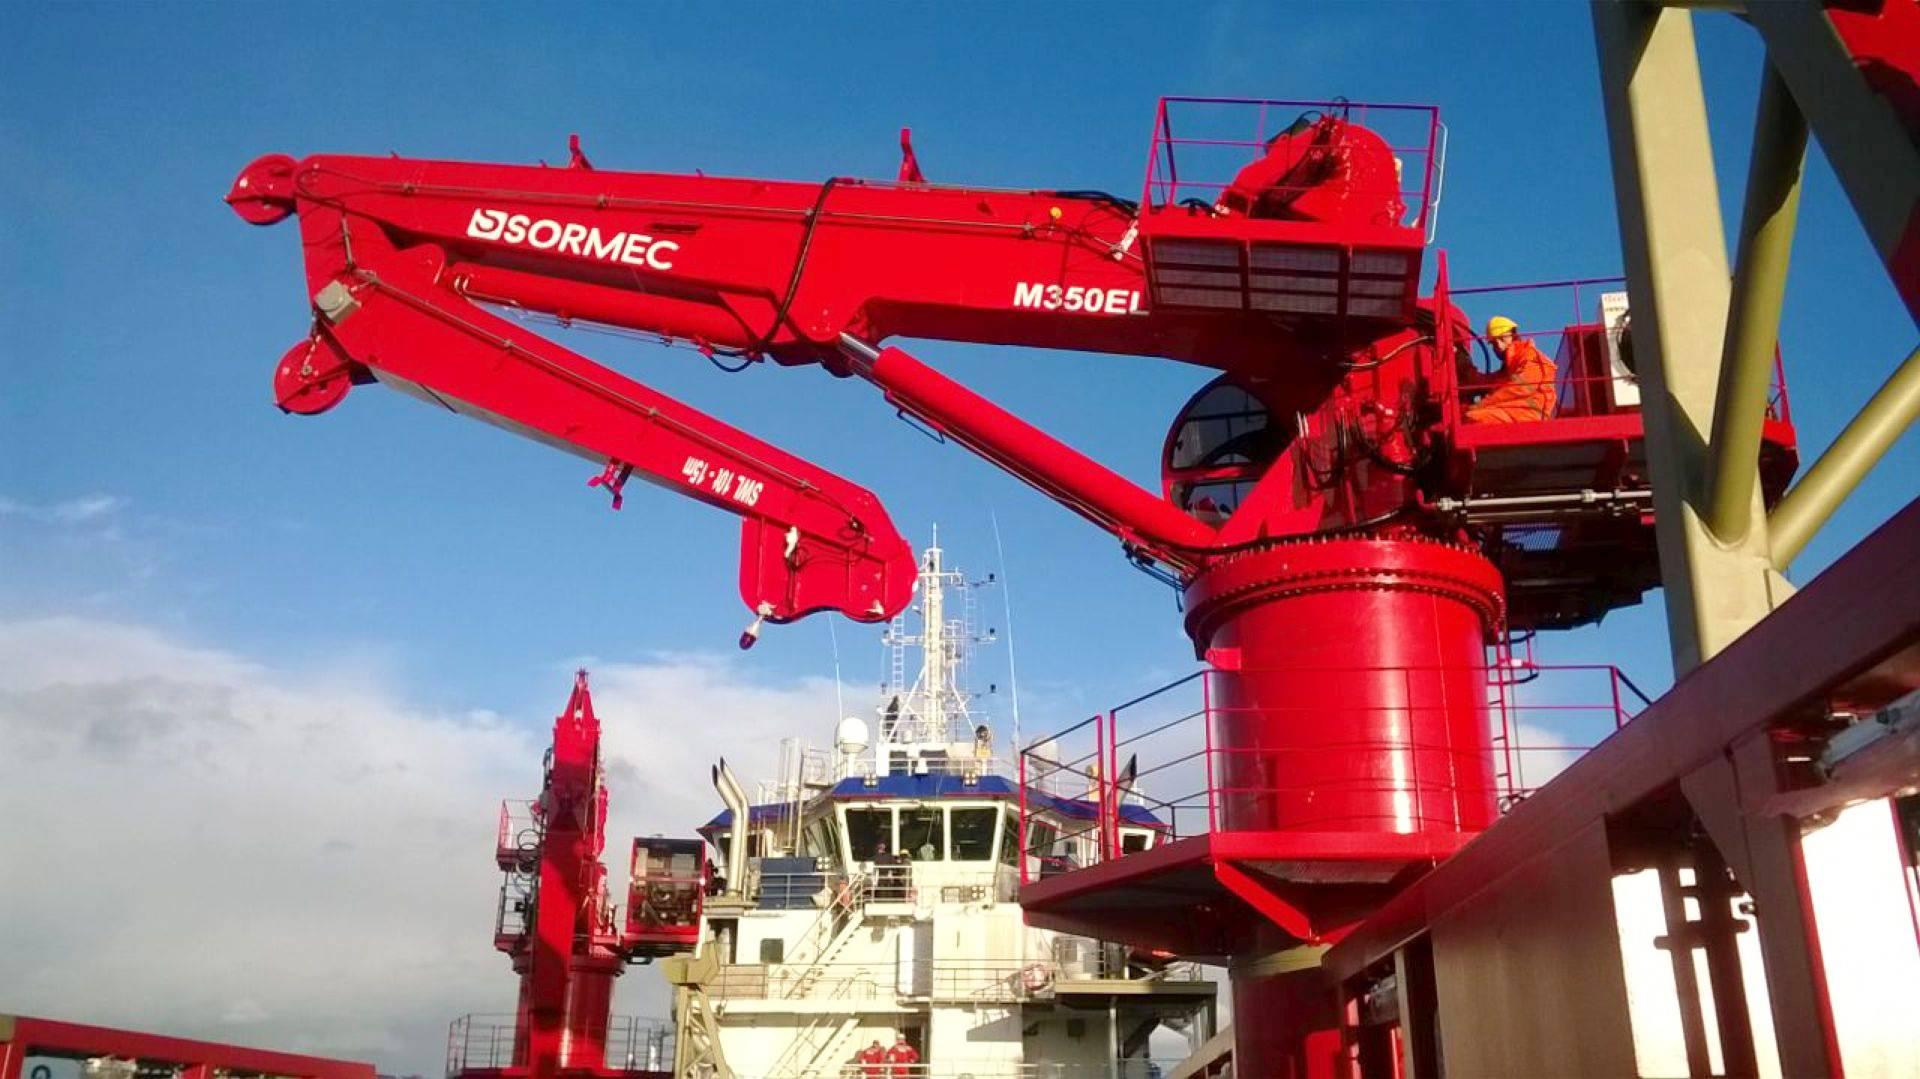 Knuckle Boom Cranes Manufacturers : Custom cranes installed aboard nigerian